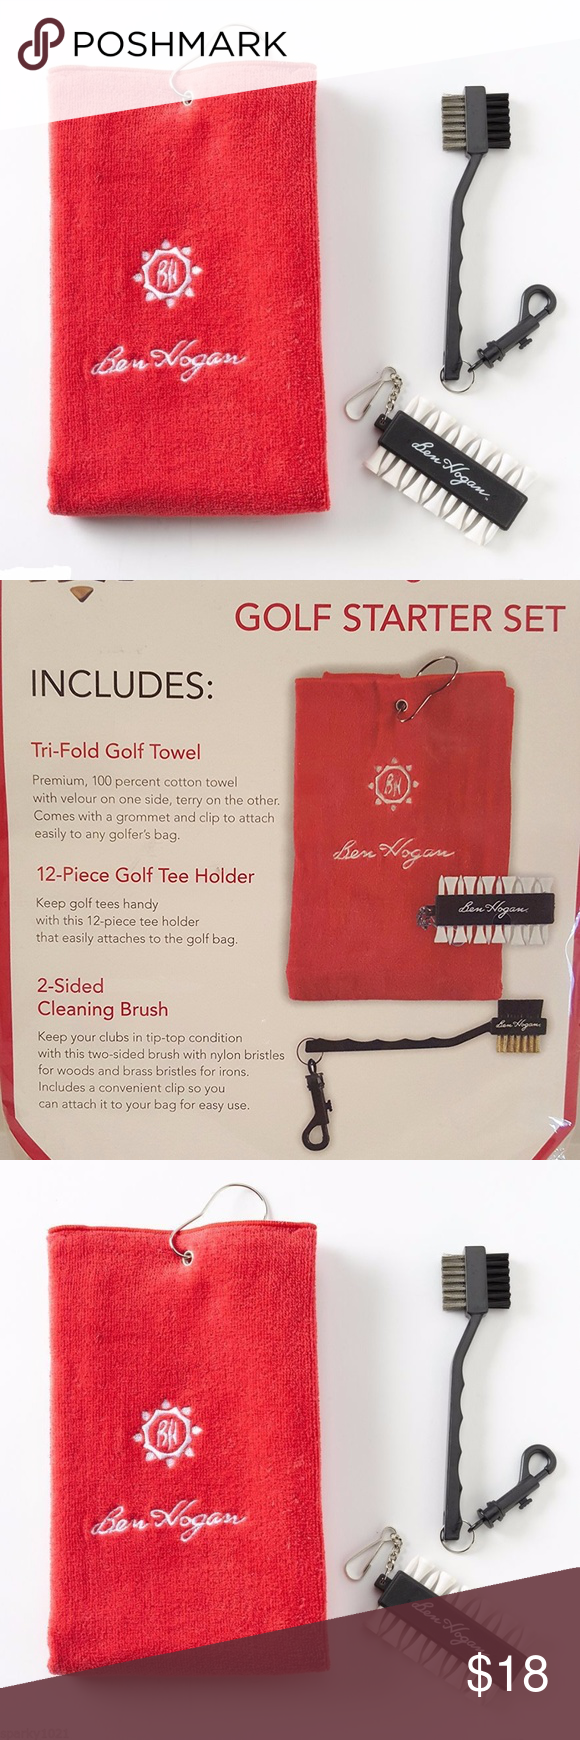 Ben Hogan Accessories Golf Starter Set   Accessories, Velour towel ...